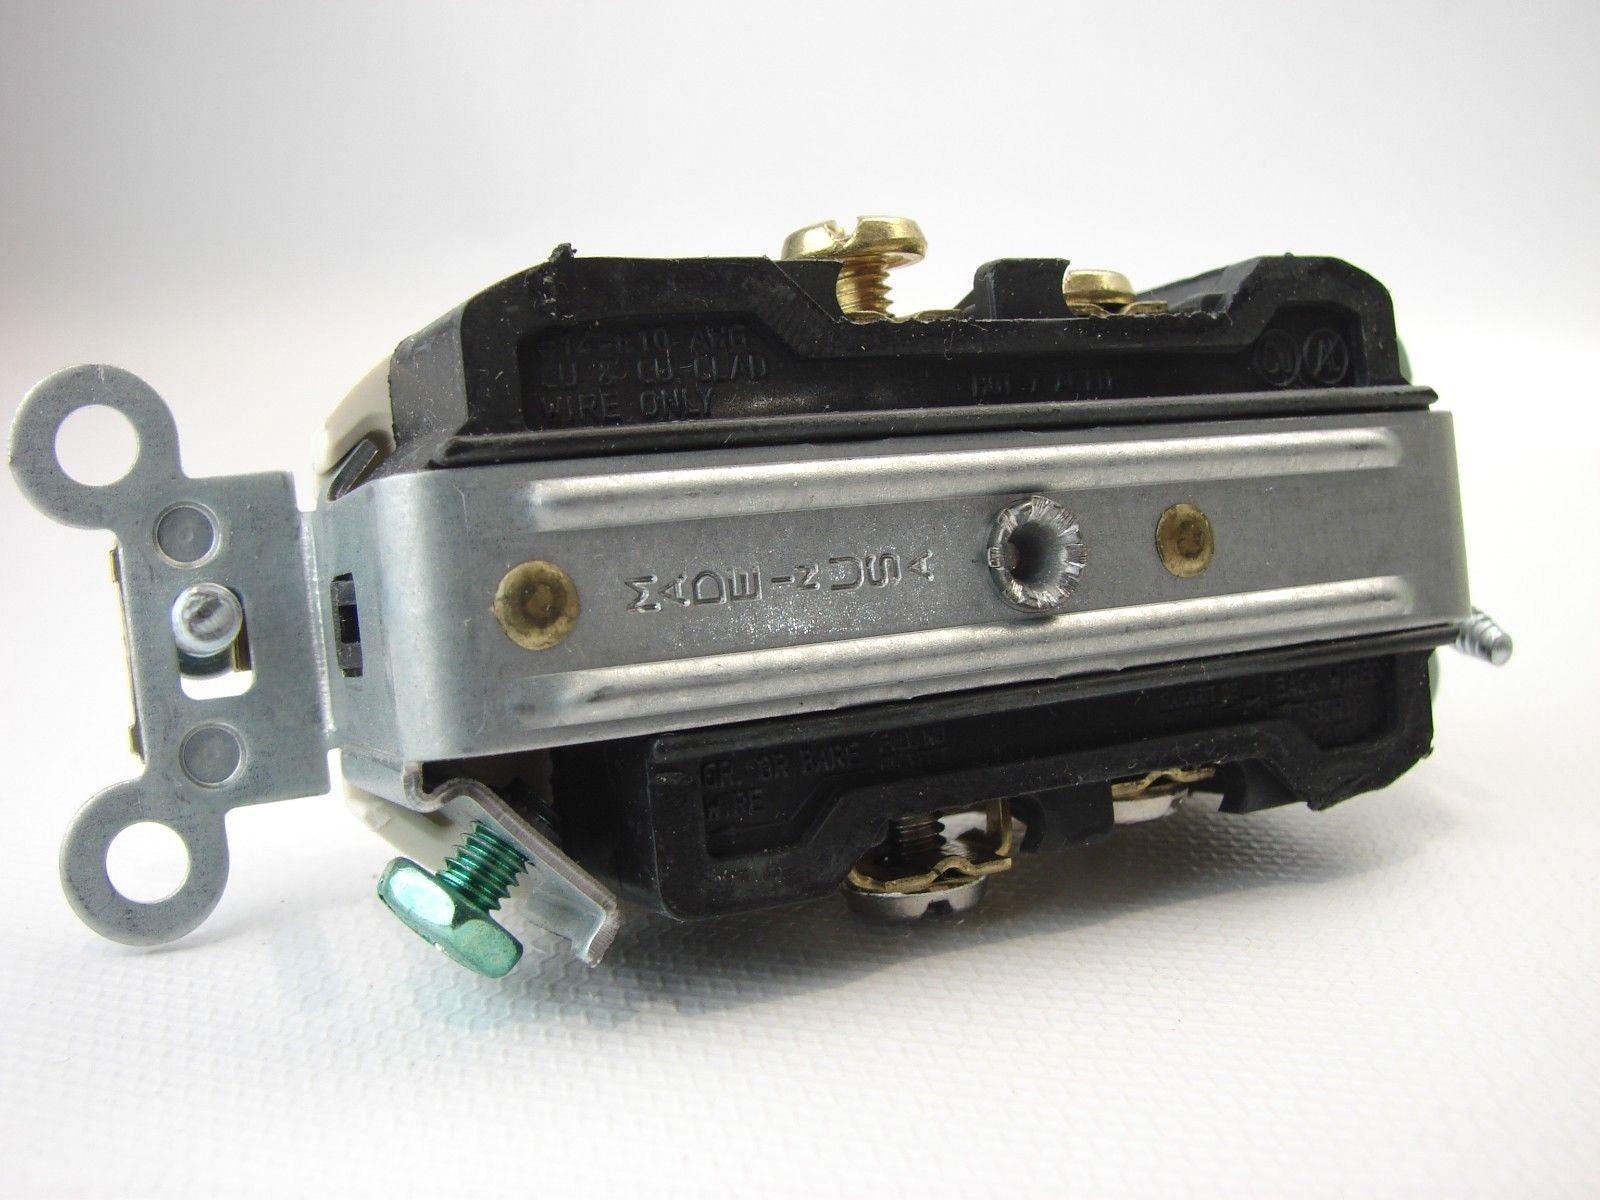 2) Leviton BR20 Duplex Receptacle 20 amps and 49 similar items